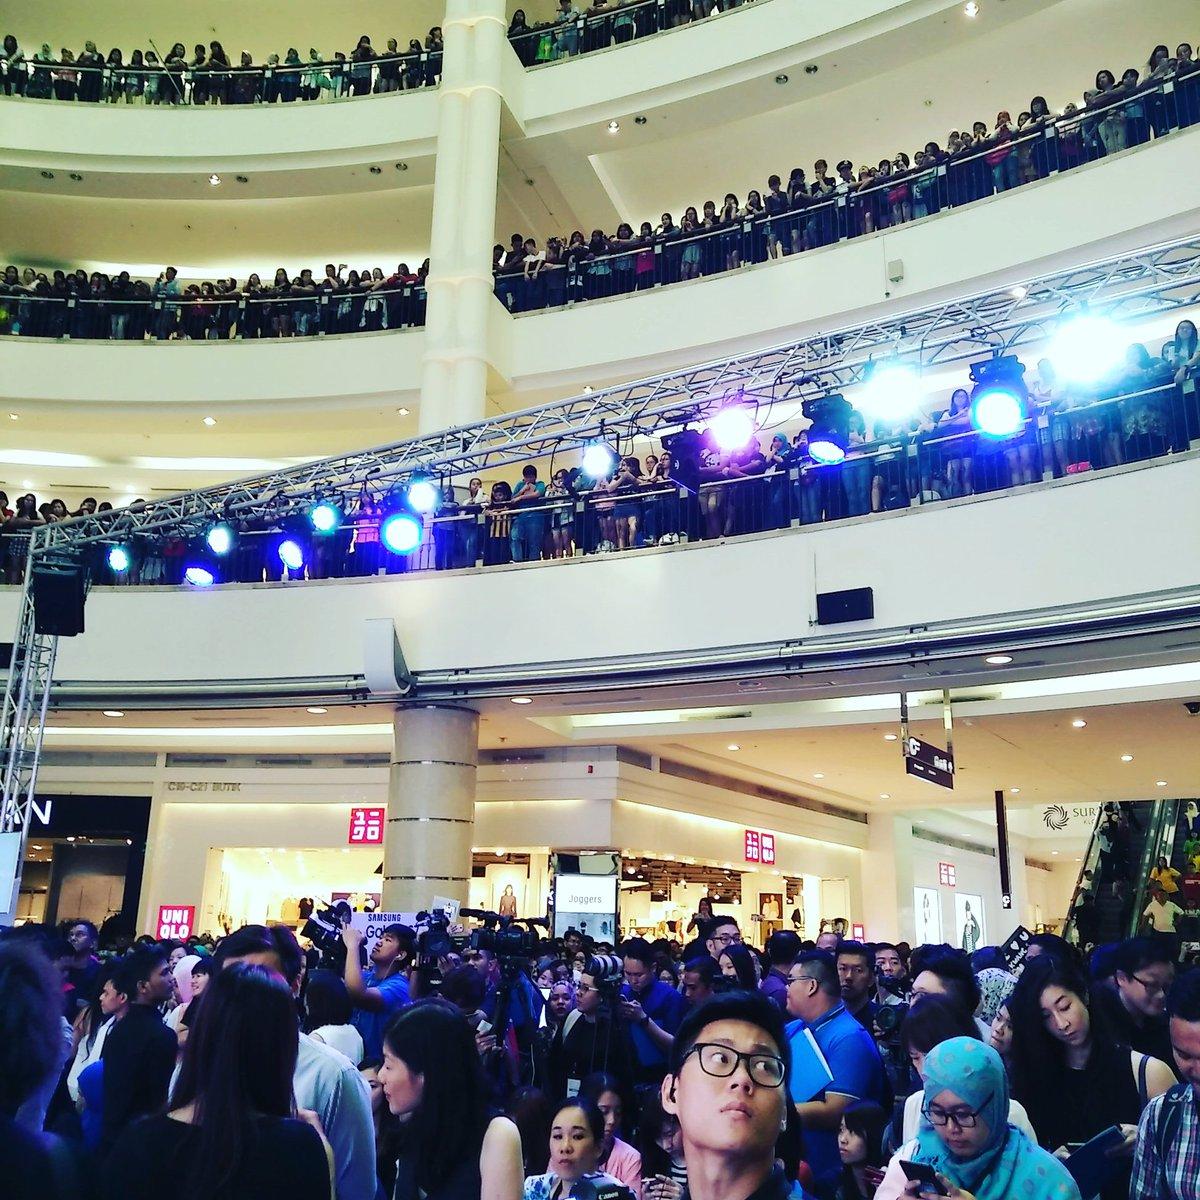 Bila kau panggil artis Korea datang ke launch event, inilah crowd yang akan kau akan terima https://t.co/2z3qKzCXjJ